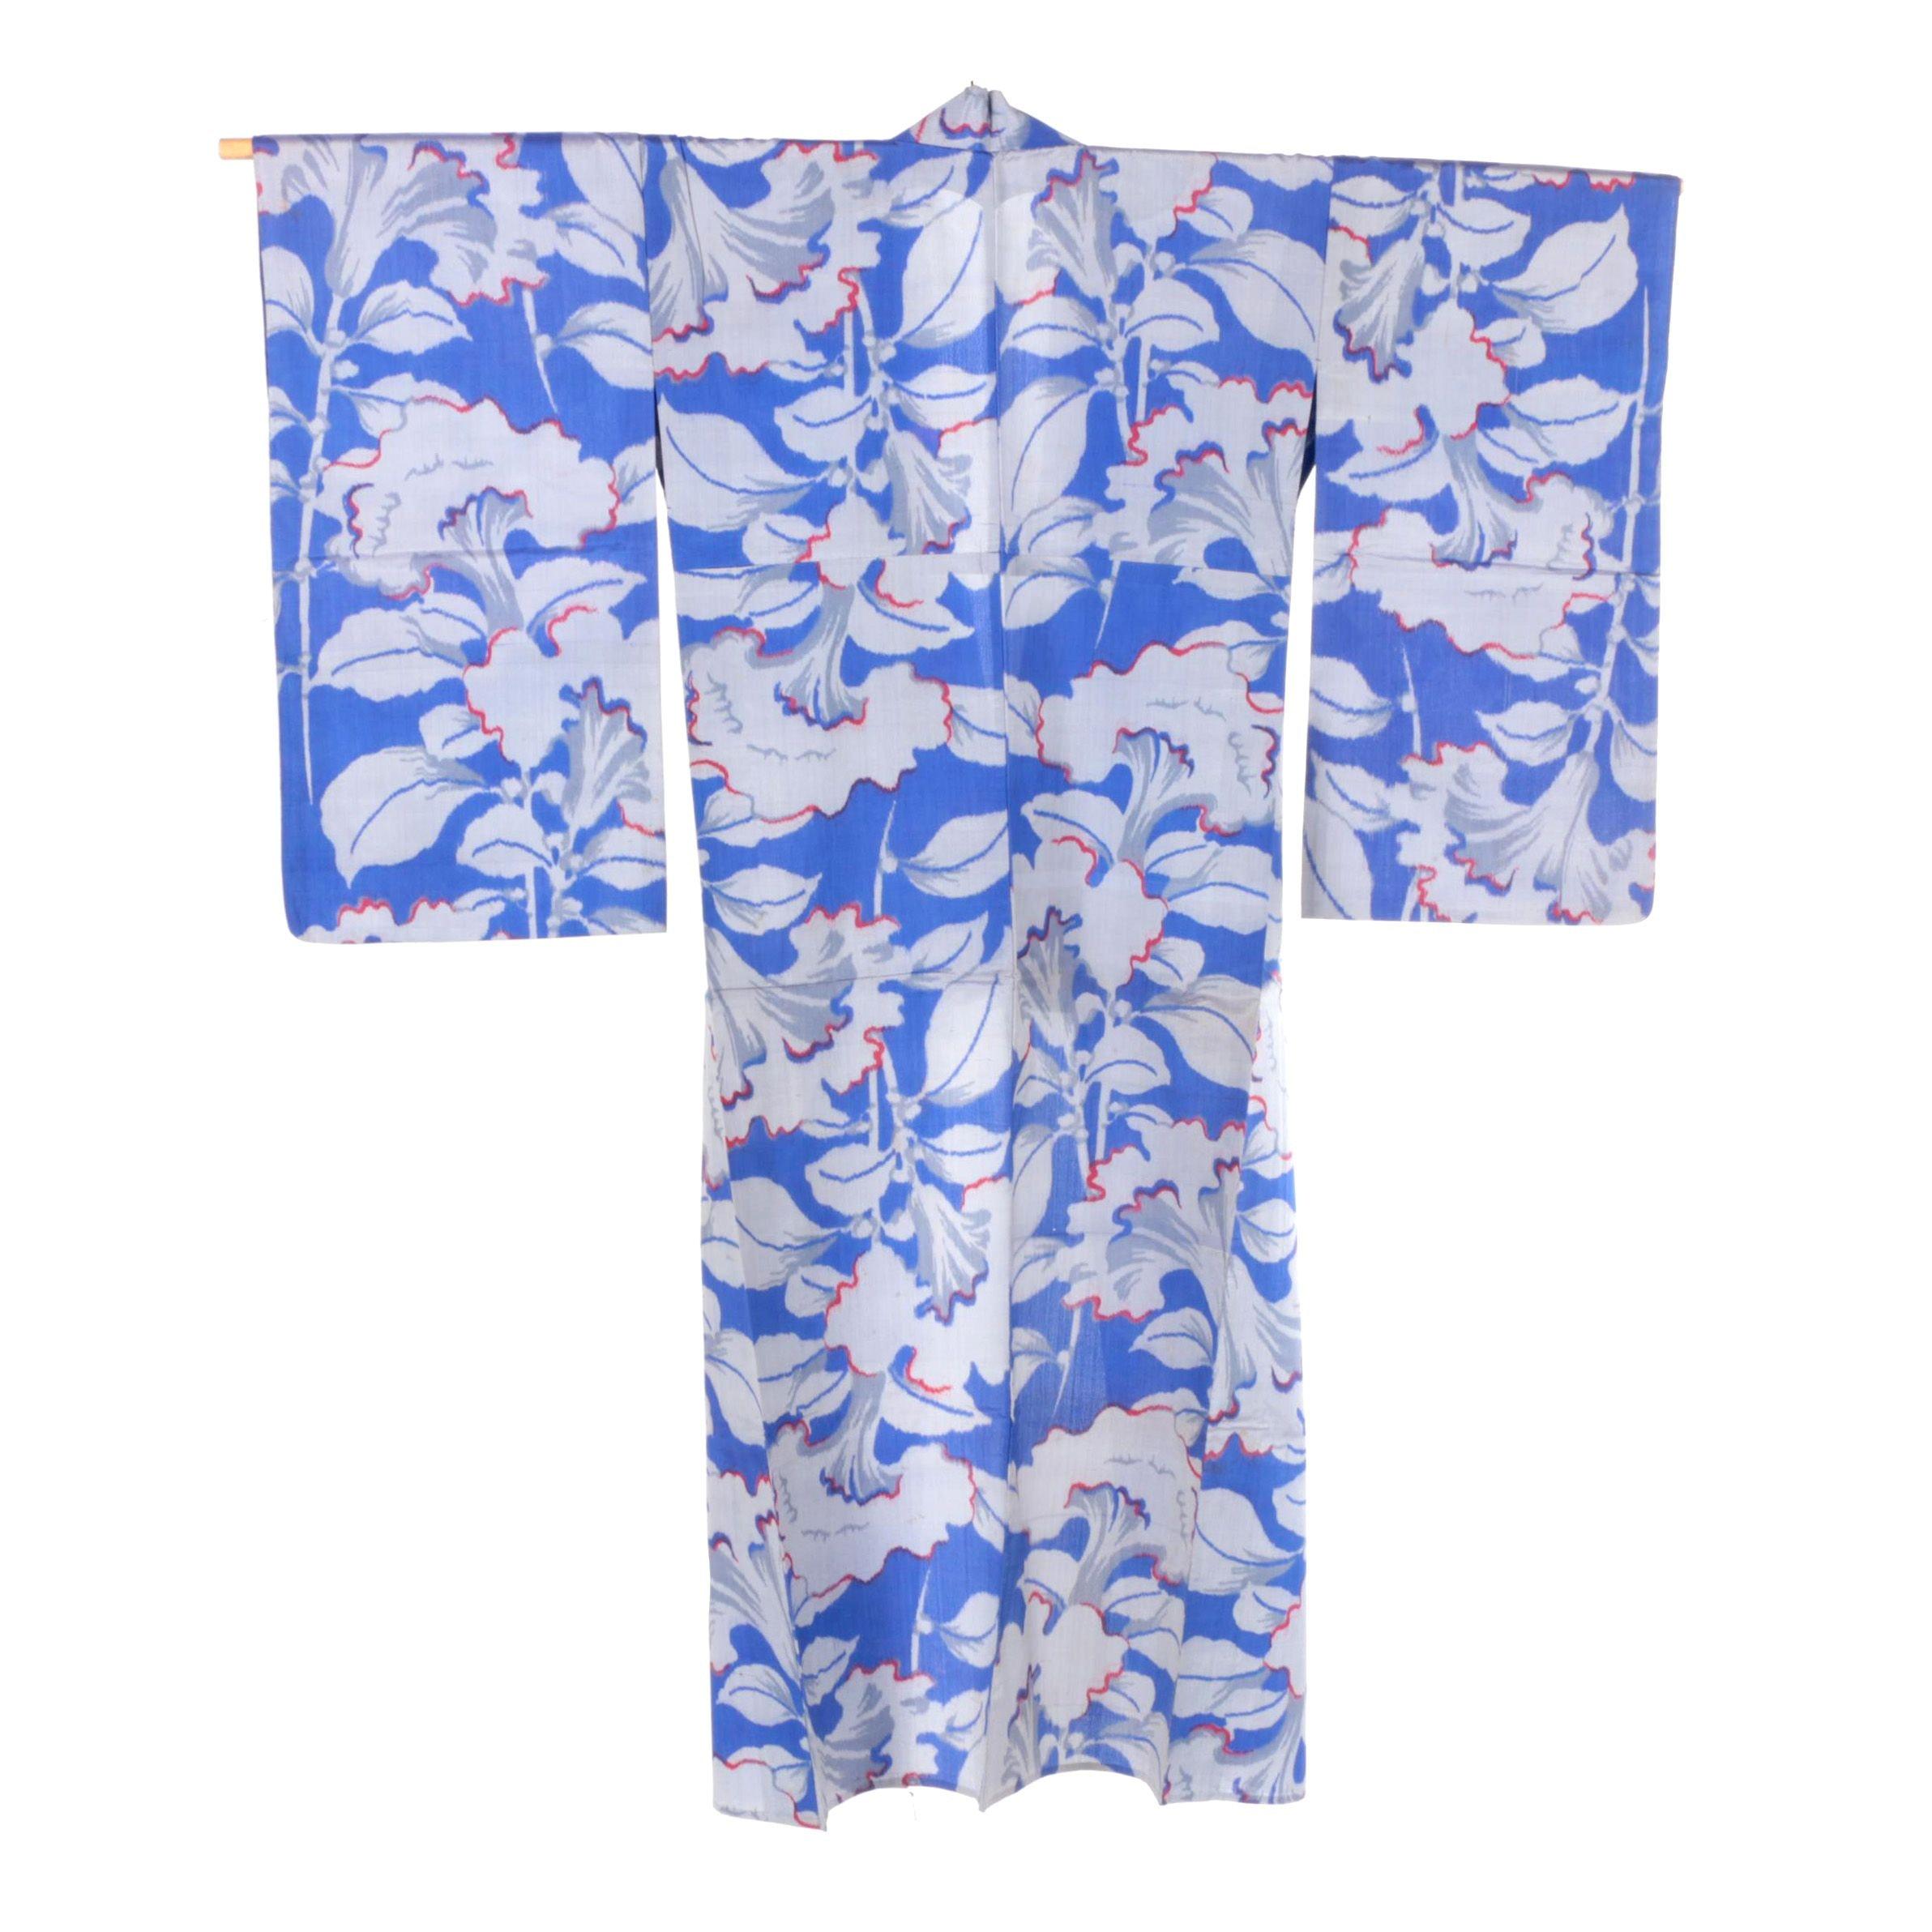 Circa 1930s Vintage Japanese Handwoven Silk Ikat Kimono